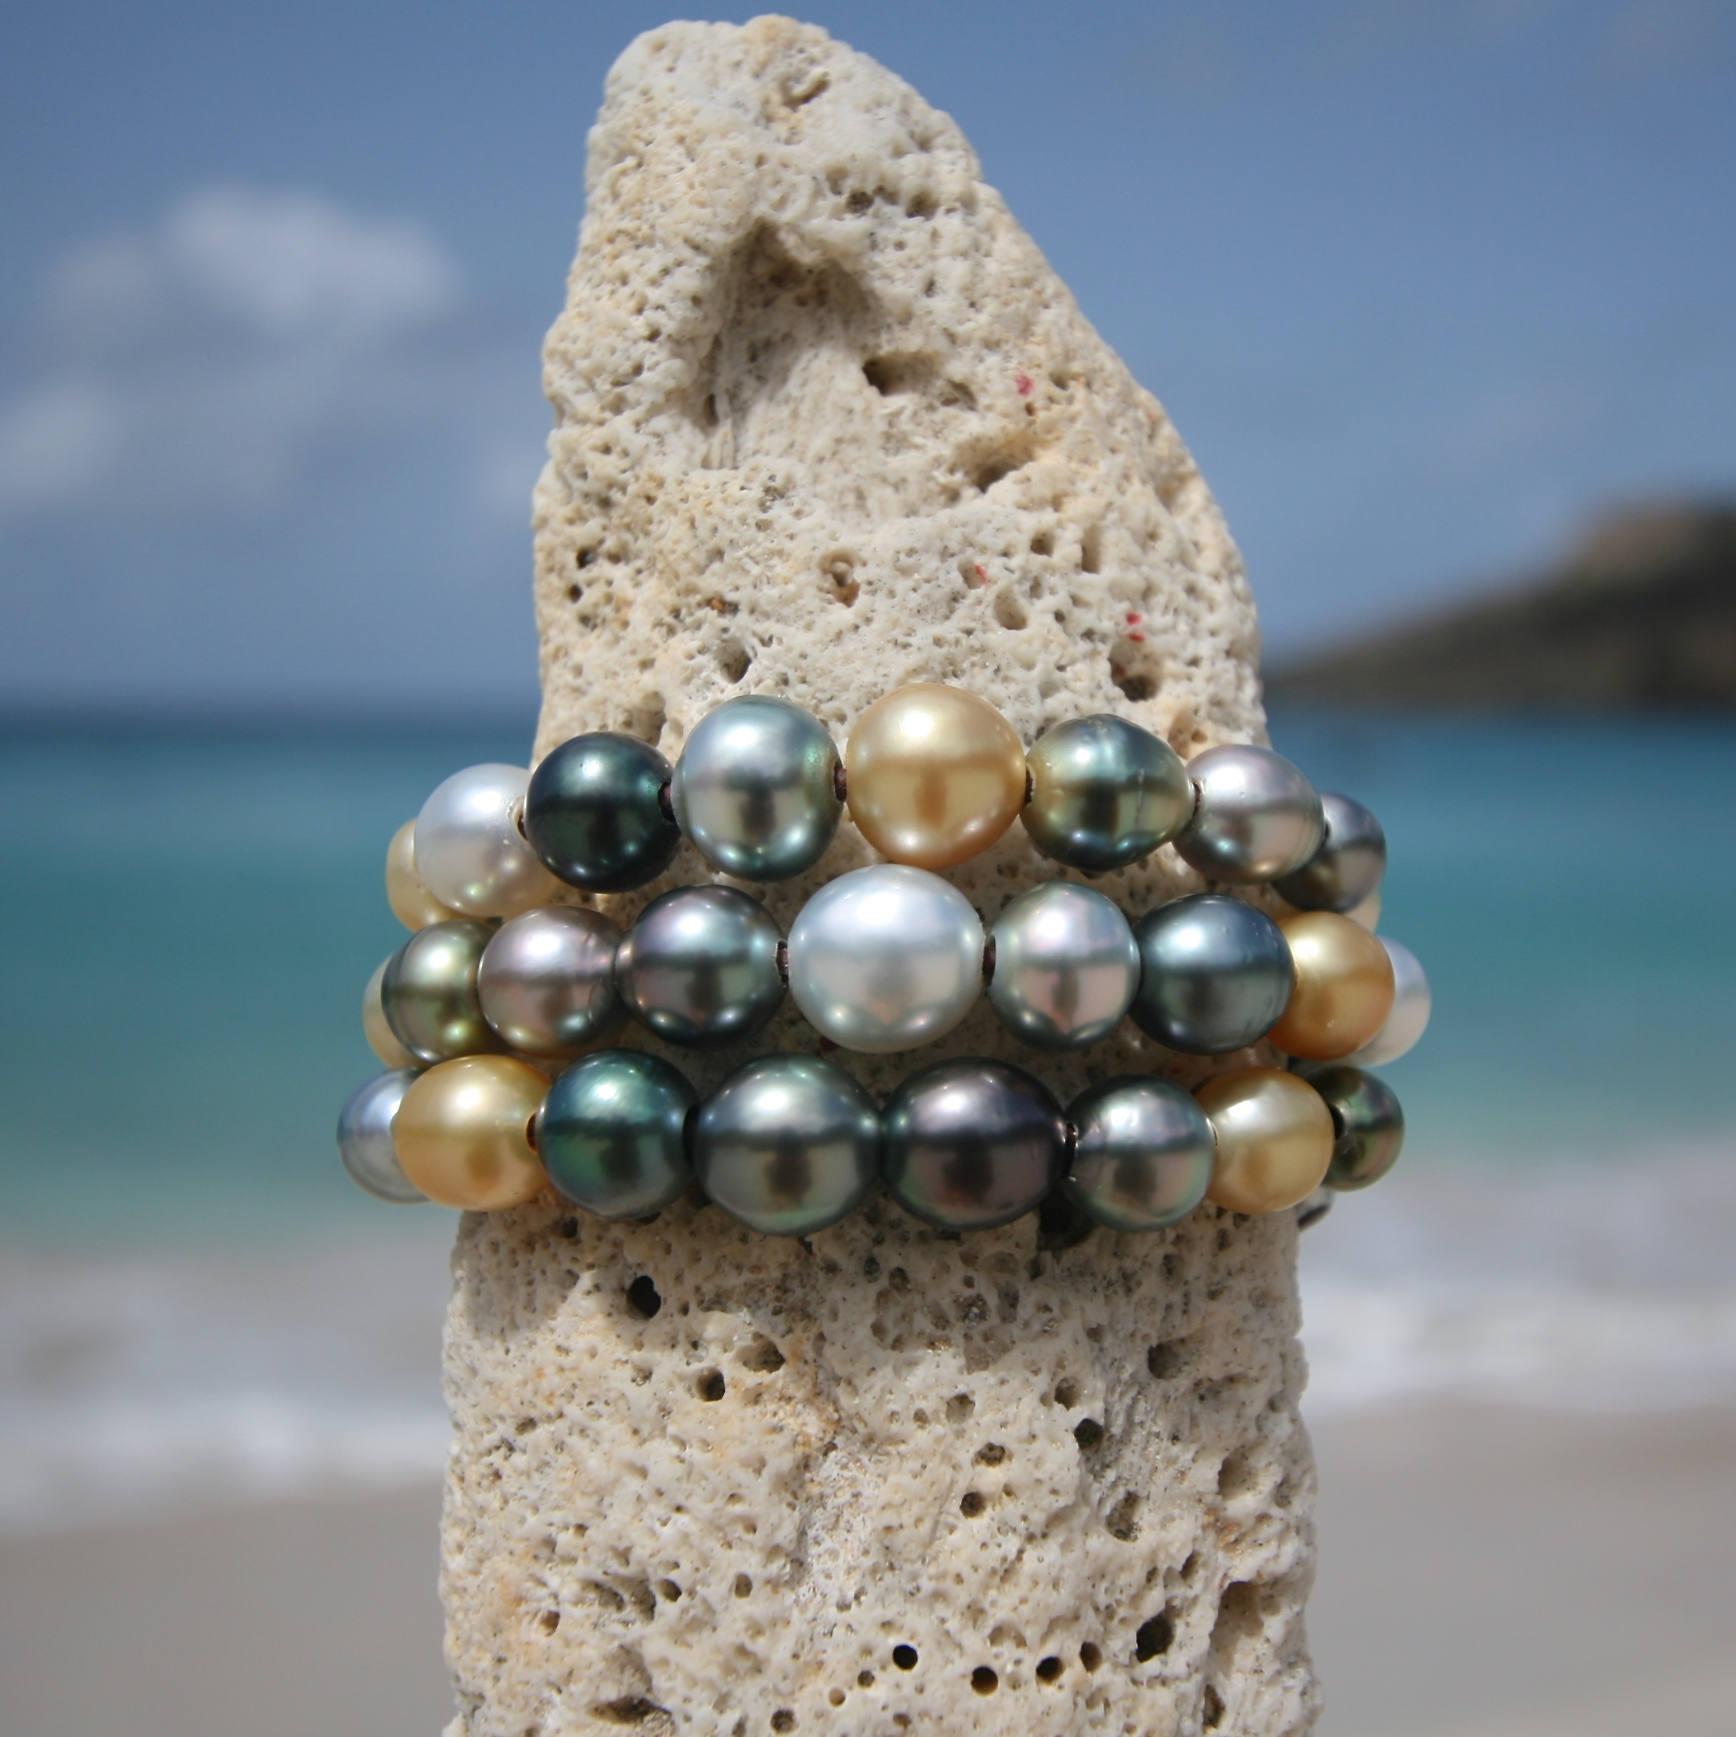 St barth jewelry pearls bracelet designs